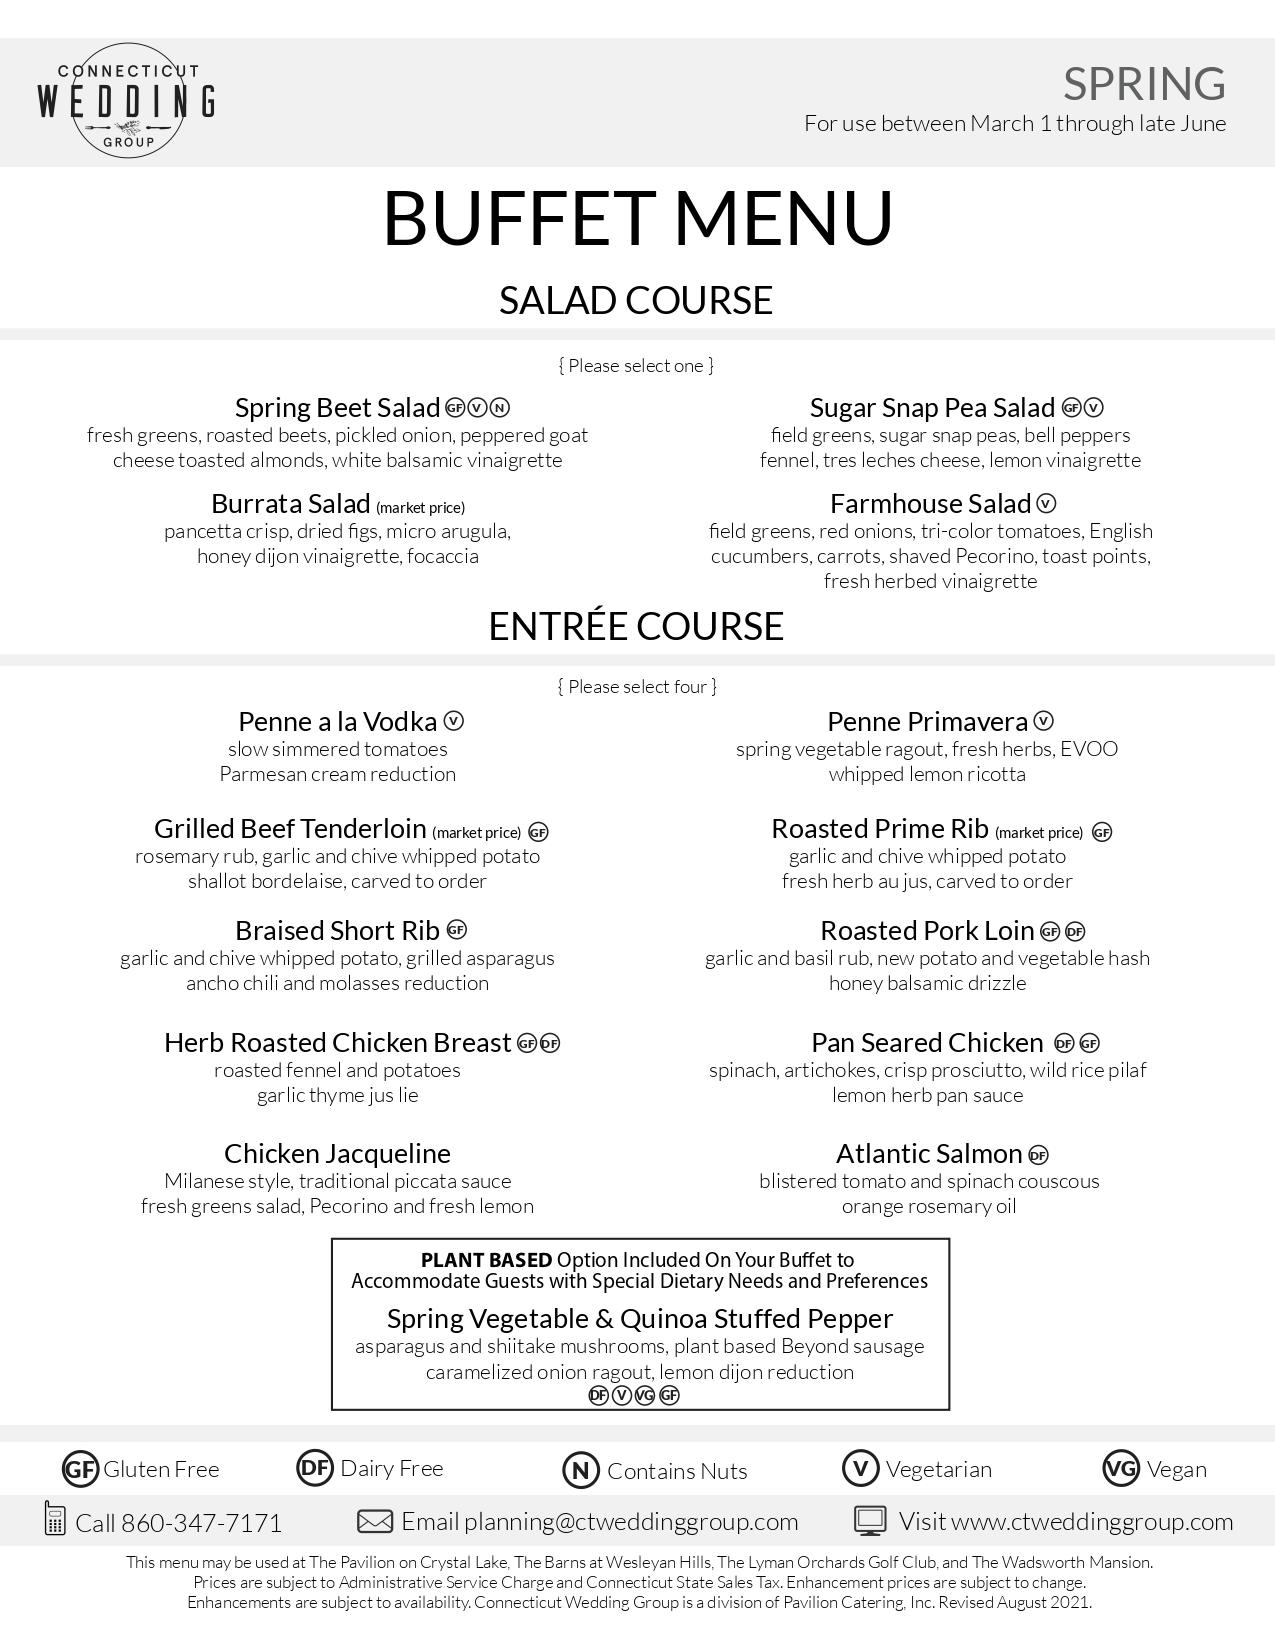 Spring-Buffet-Menu-2022